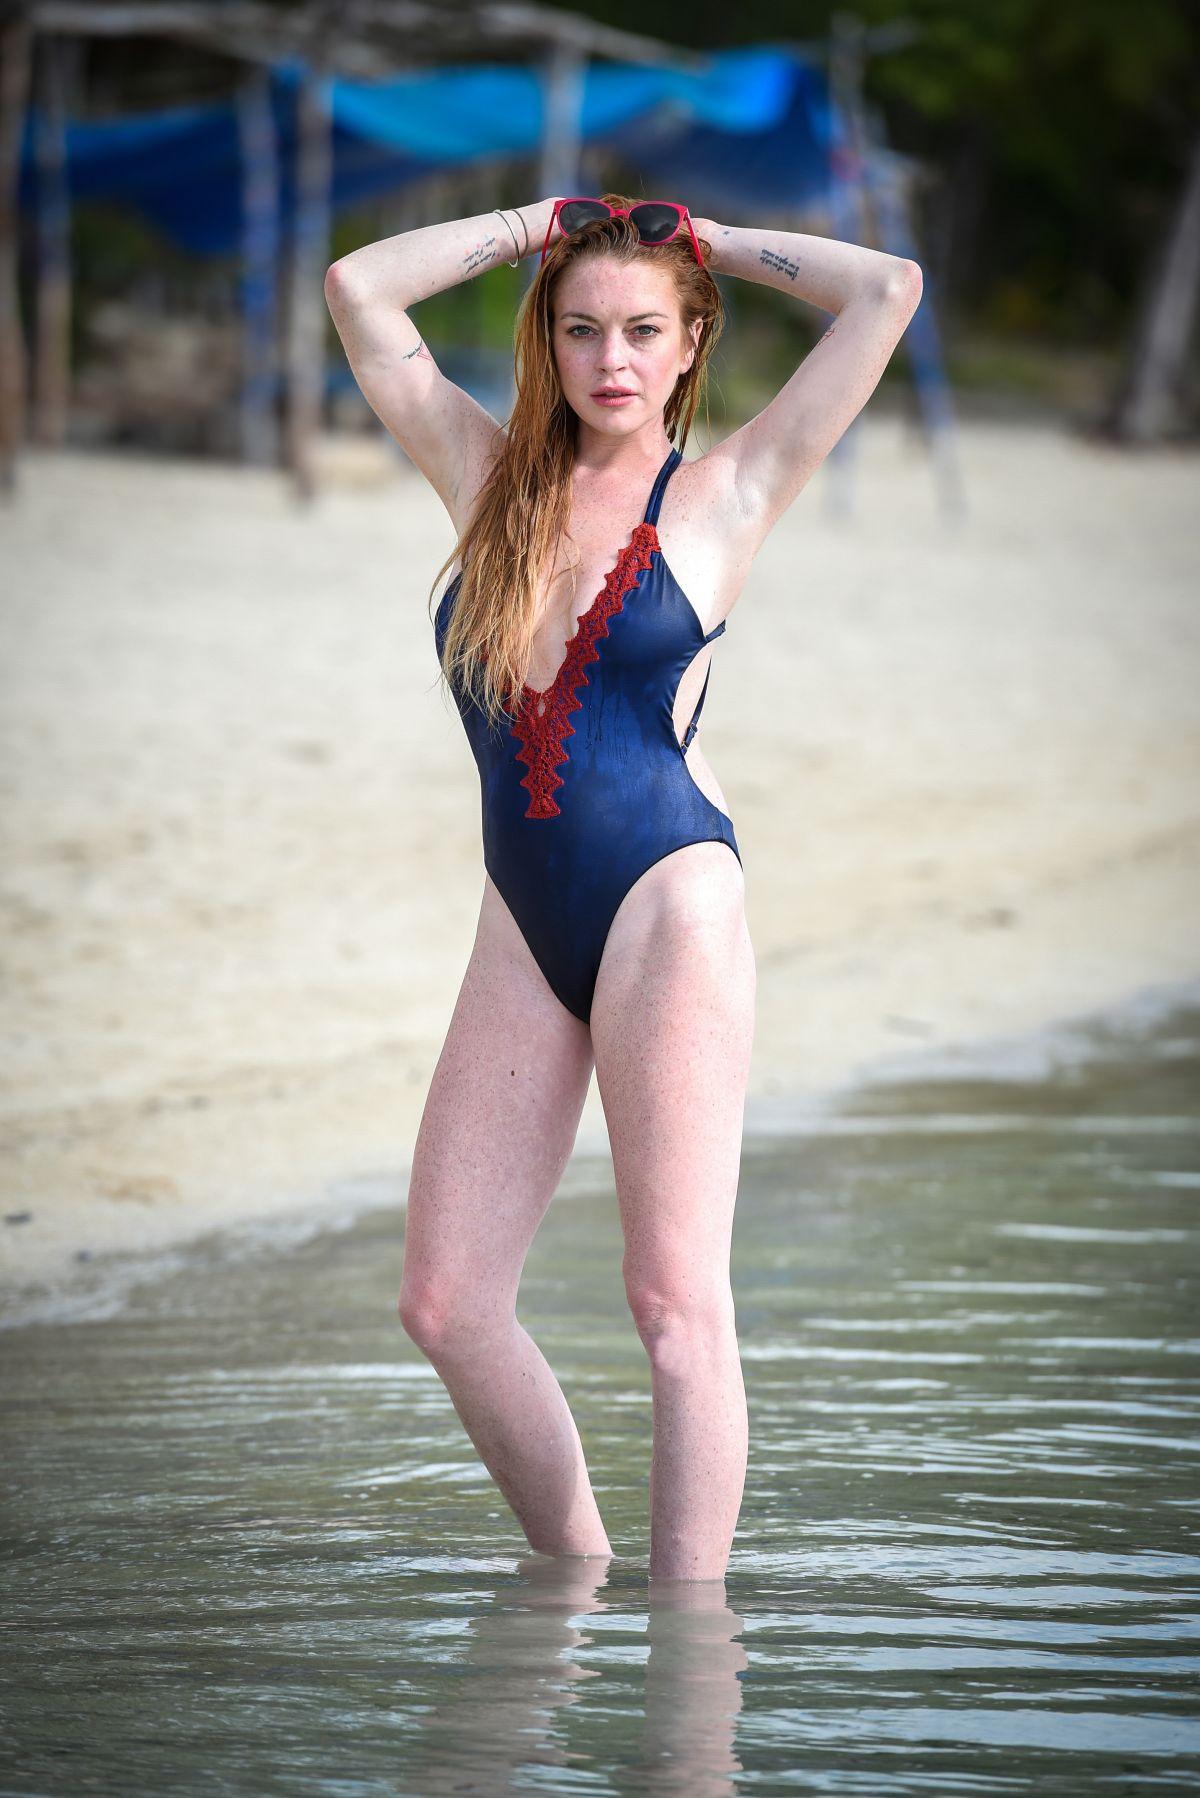 LINDSAY LOHAN in Swimsuit in Mauritius, June 2016